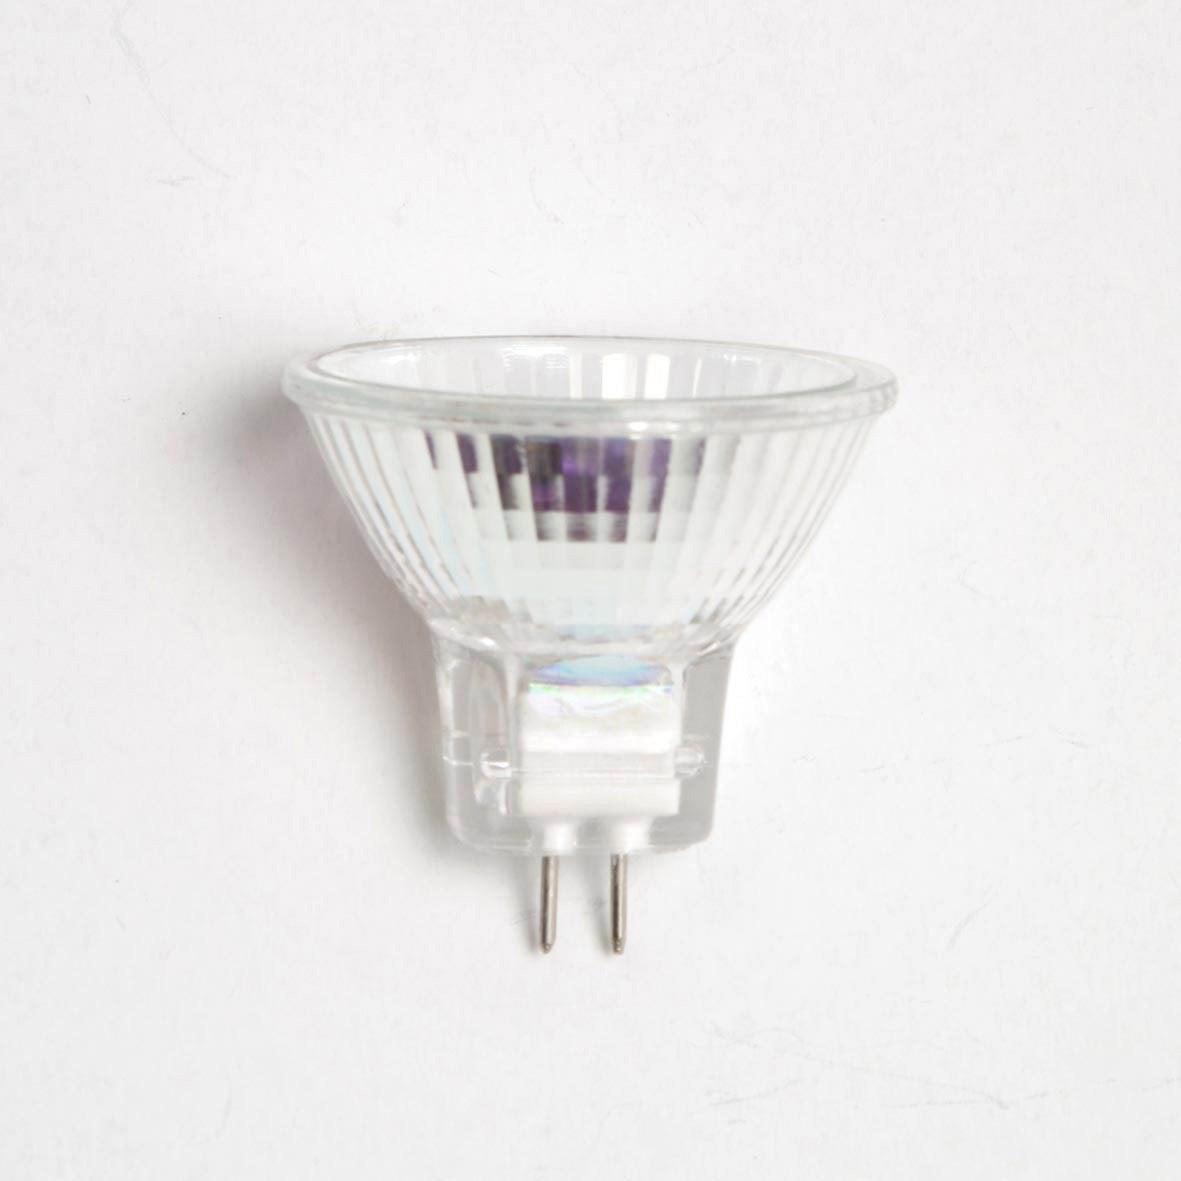 Ampoule R Flecteur Halog Ne 14w Lexman Gu 5 3 Lumi Re Chaude Environ 2700 K Leroy Merlin